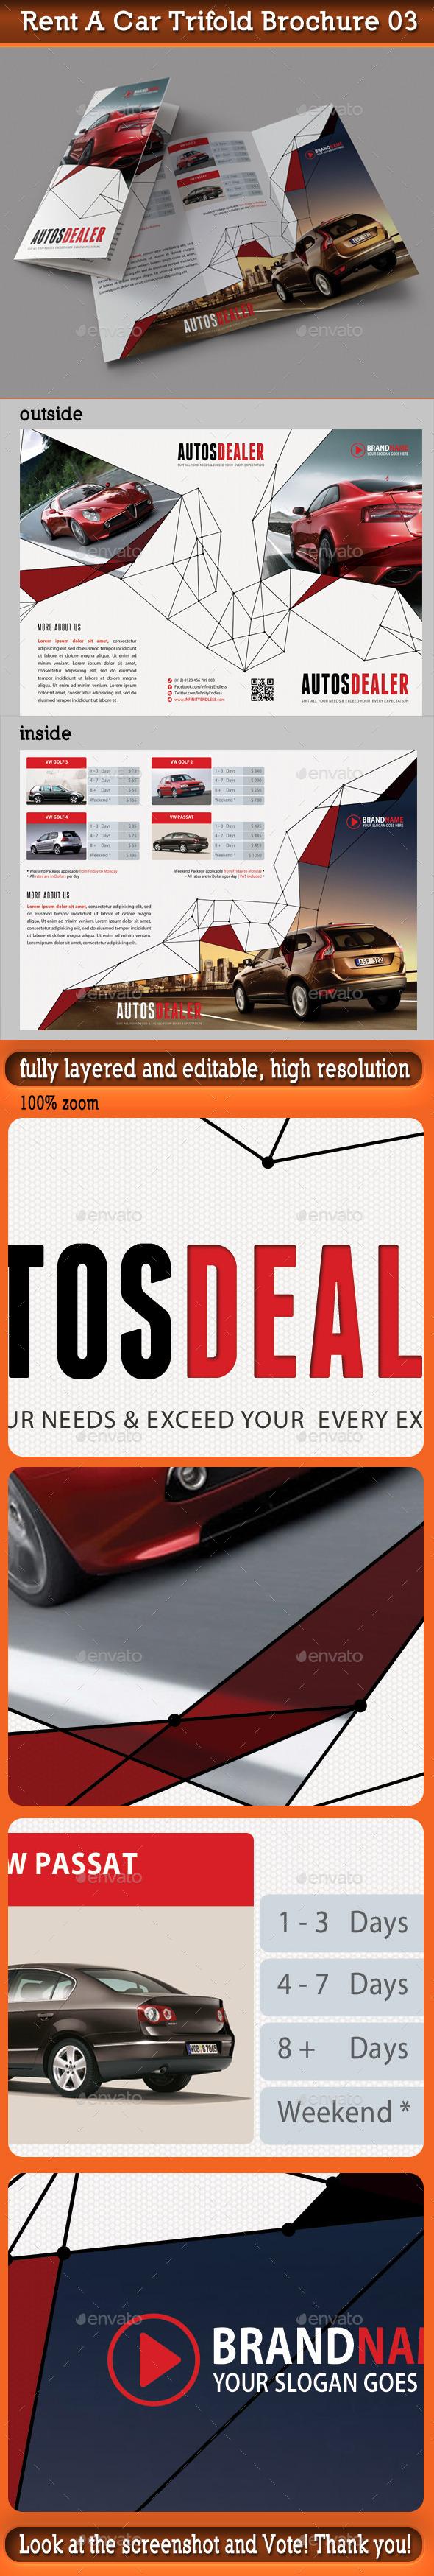 Rent A Car Trifold Brochure 03 - Corporate Brochures